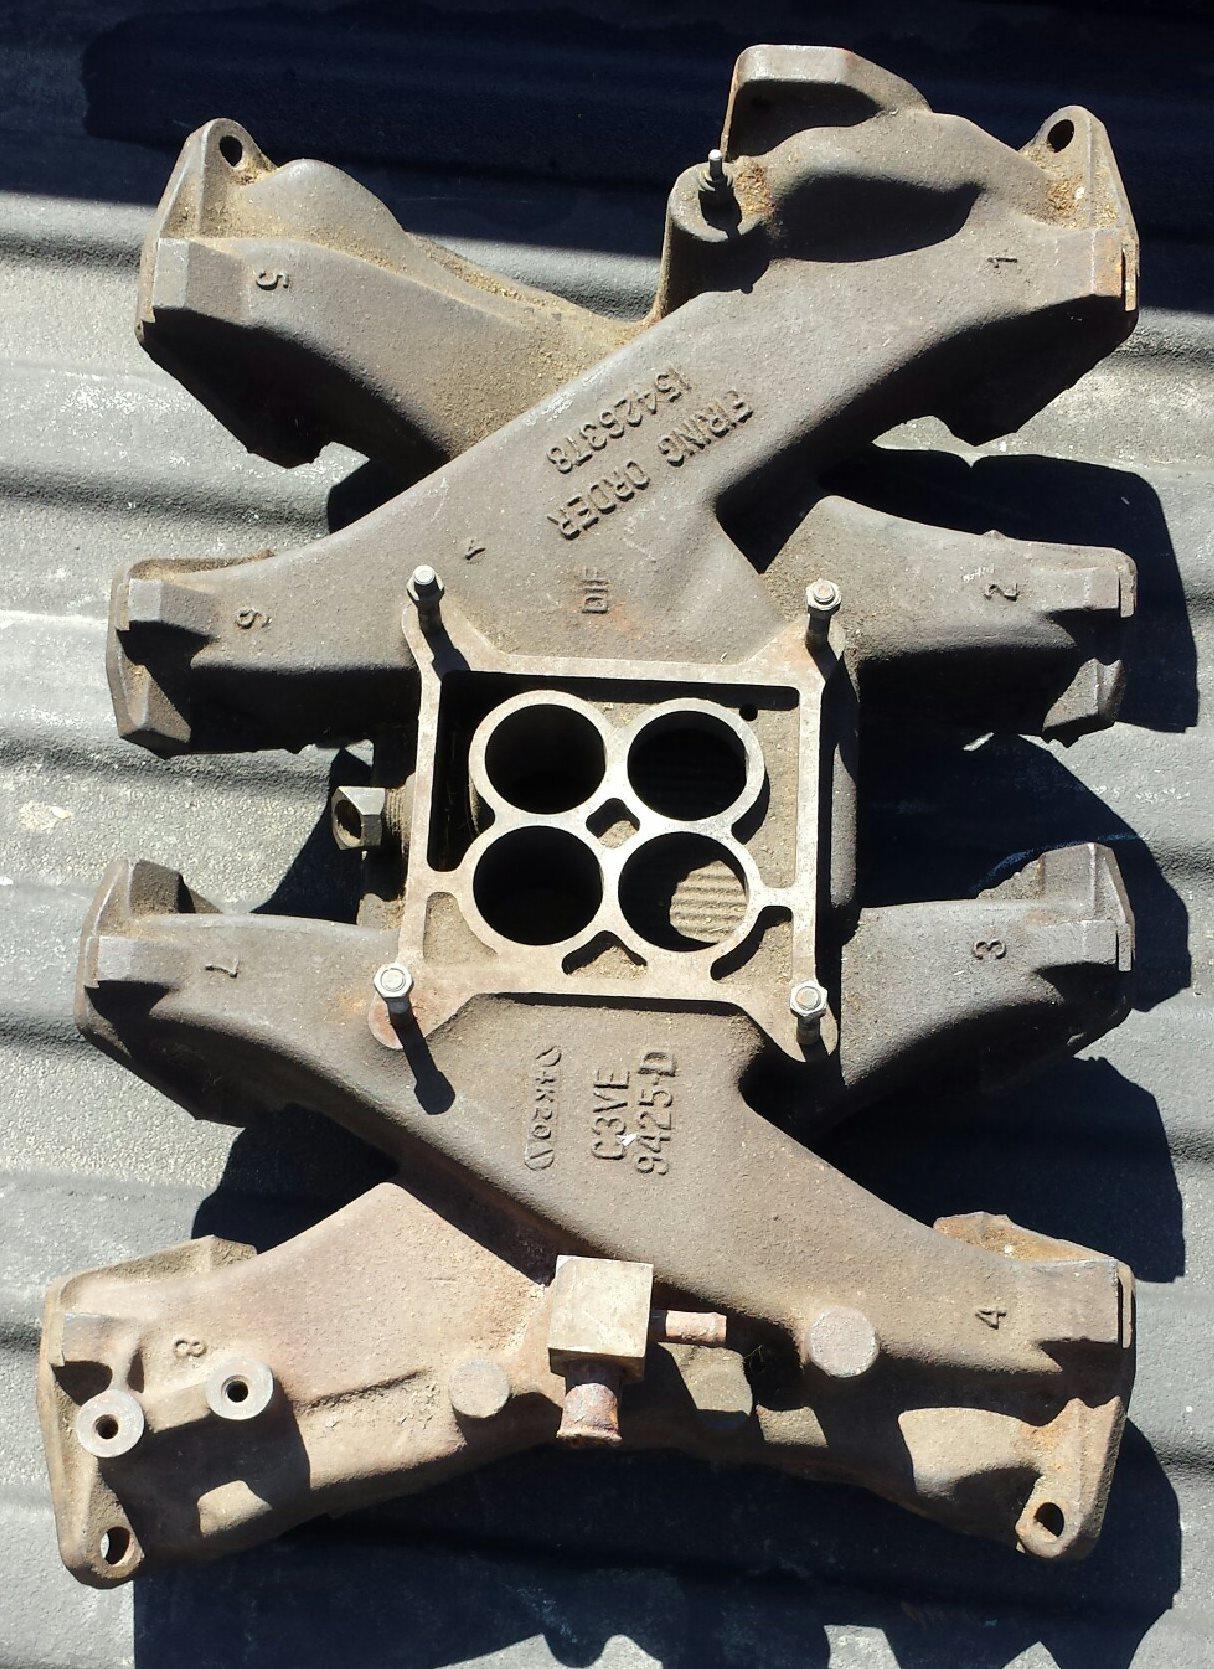 430 manifold top.jpeg